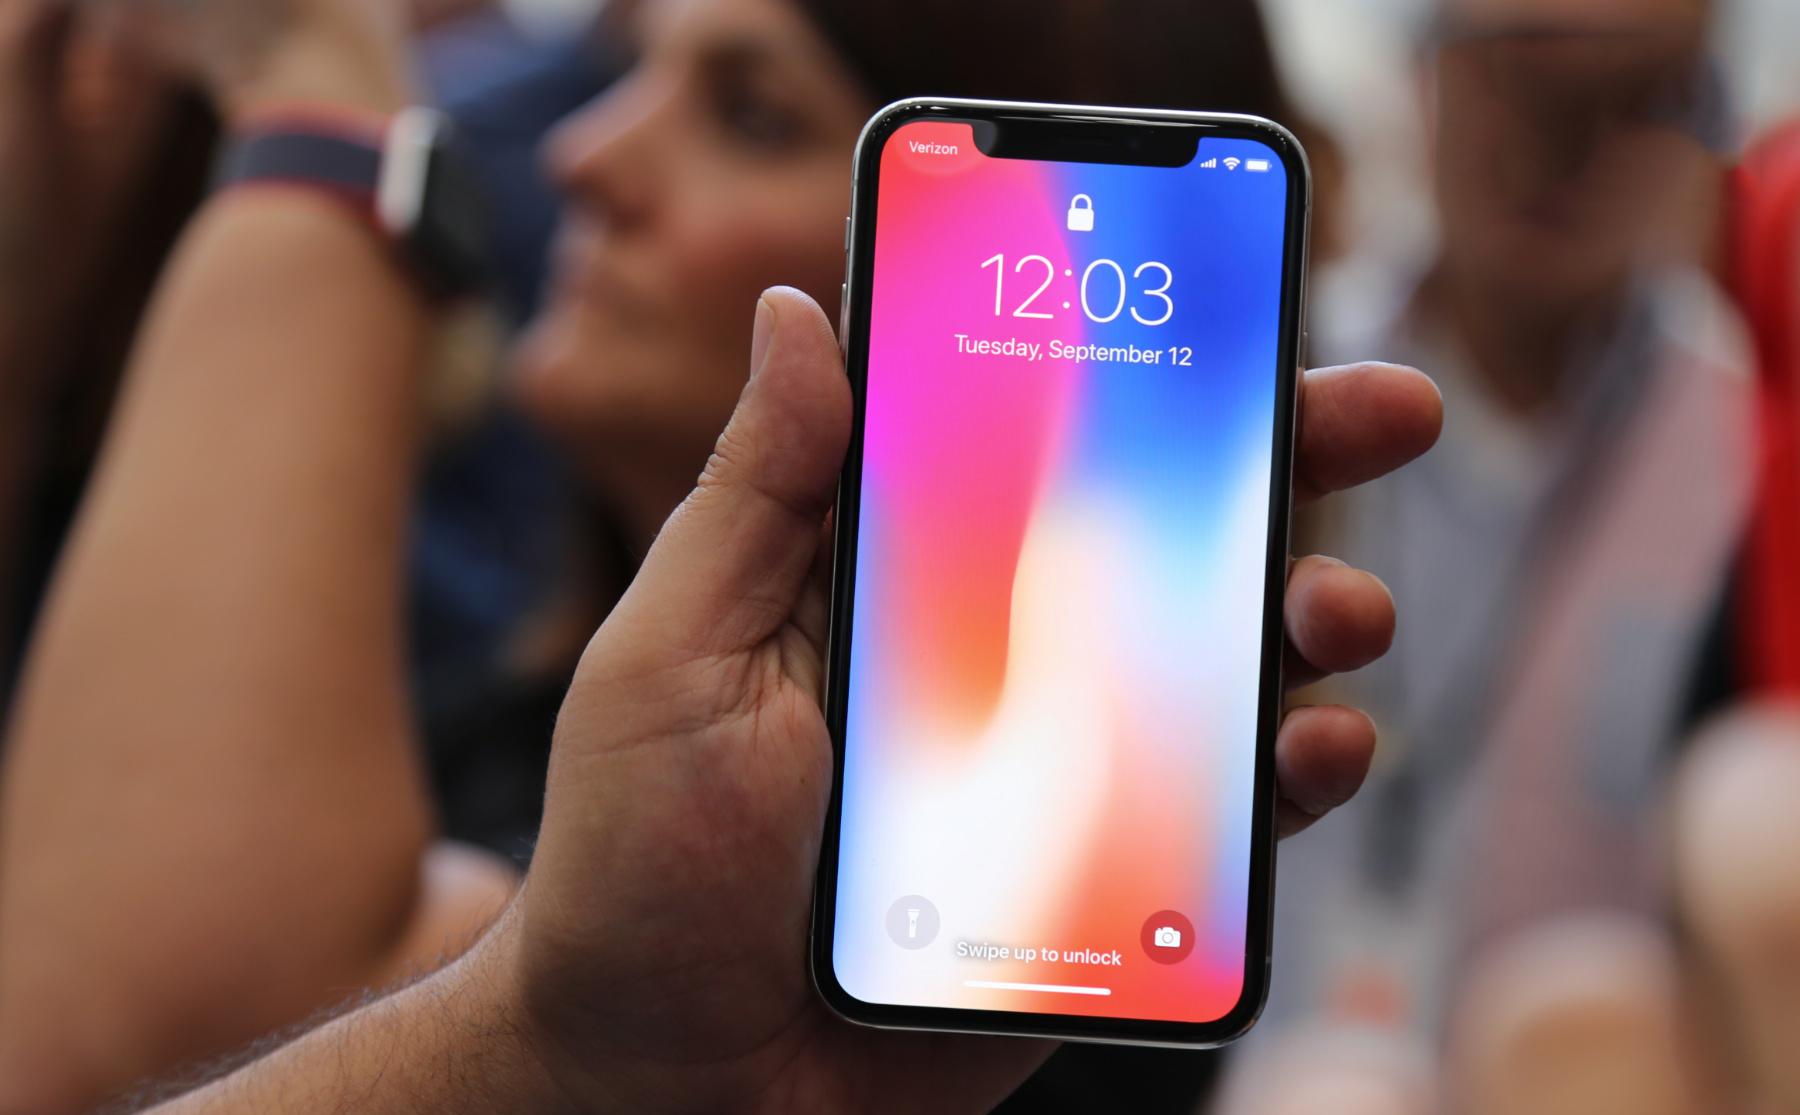 iPhone X被爆缺陷:手机的扬声器会发出咔嚓声和嗡嗡声